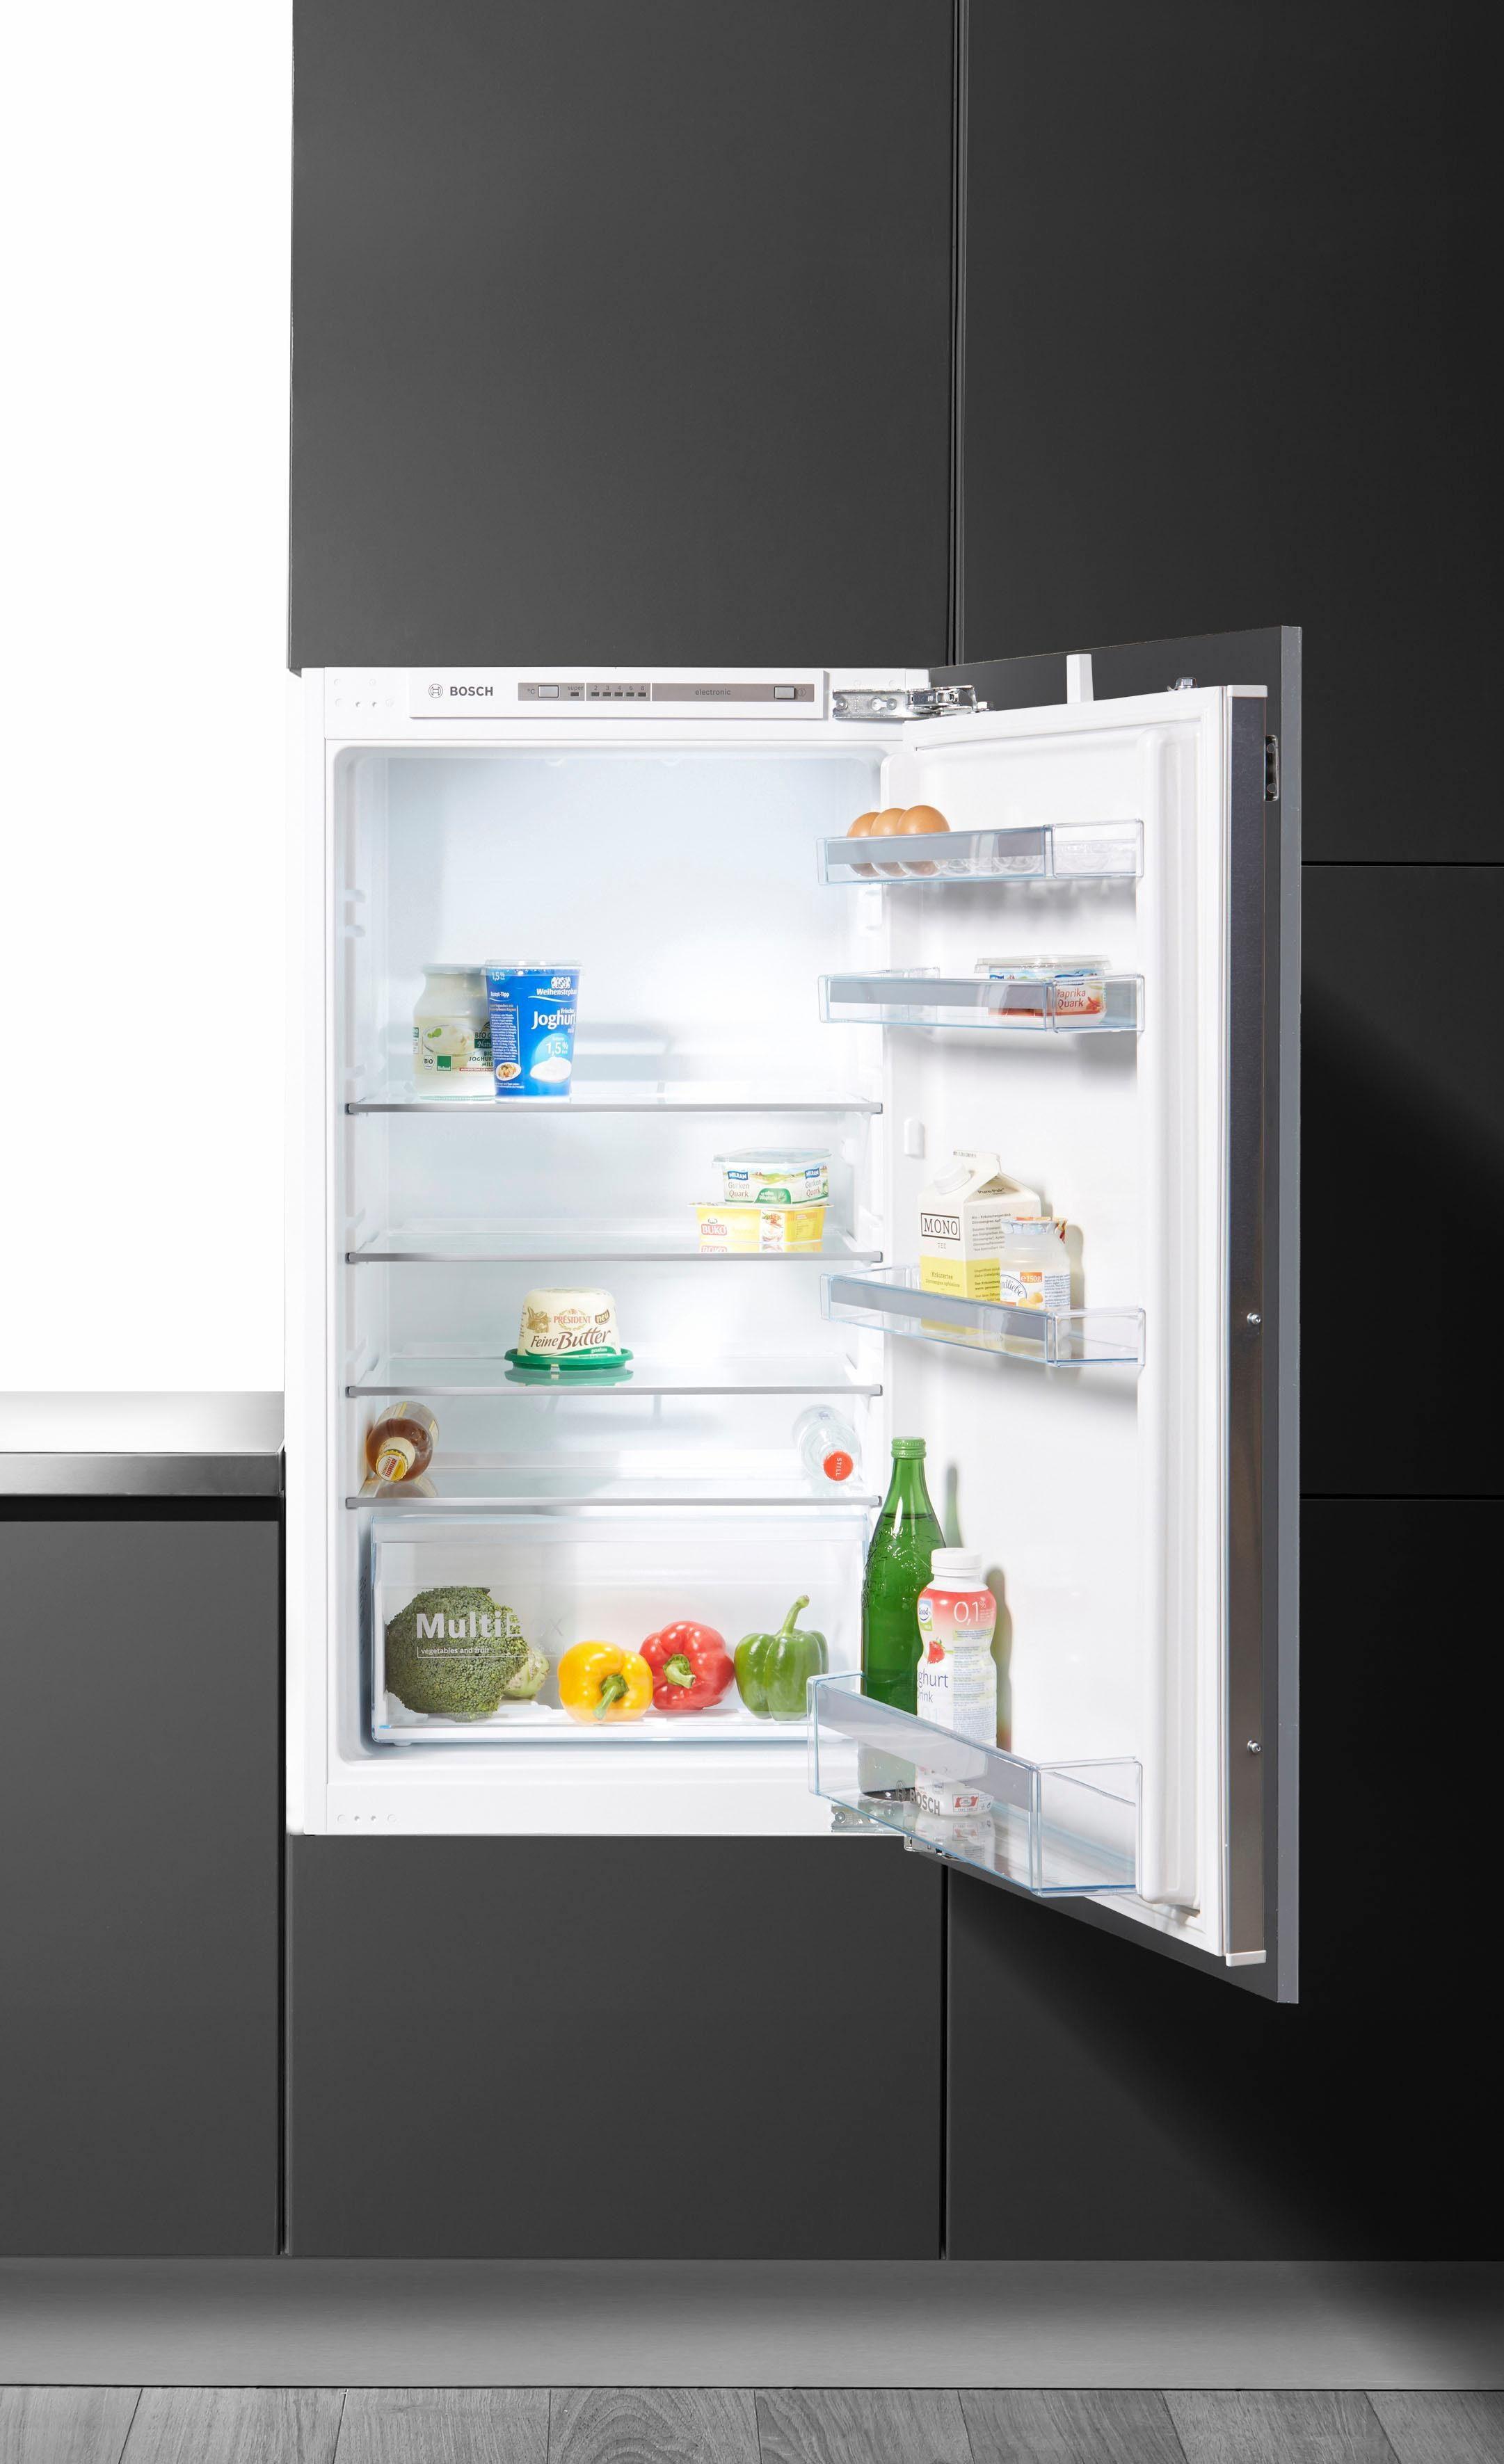 BOSCH Einbaukühlschrank KIR31VF30, 102,1 cm hoch, 54,1 cm breit, A++, 102,1 cm